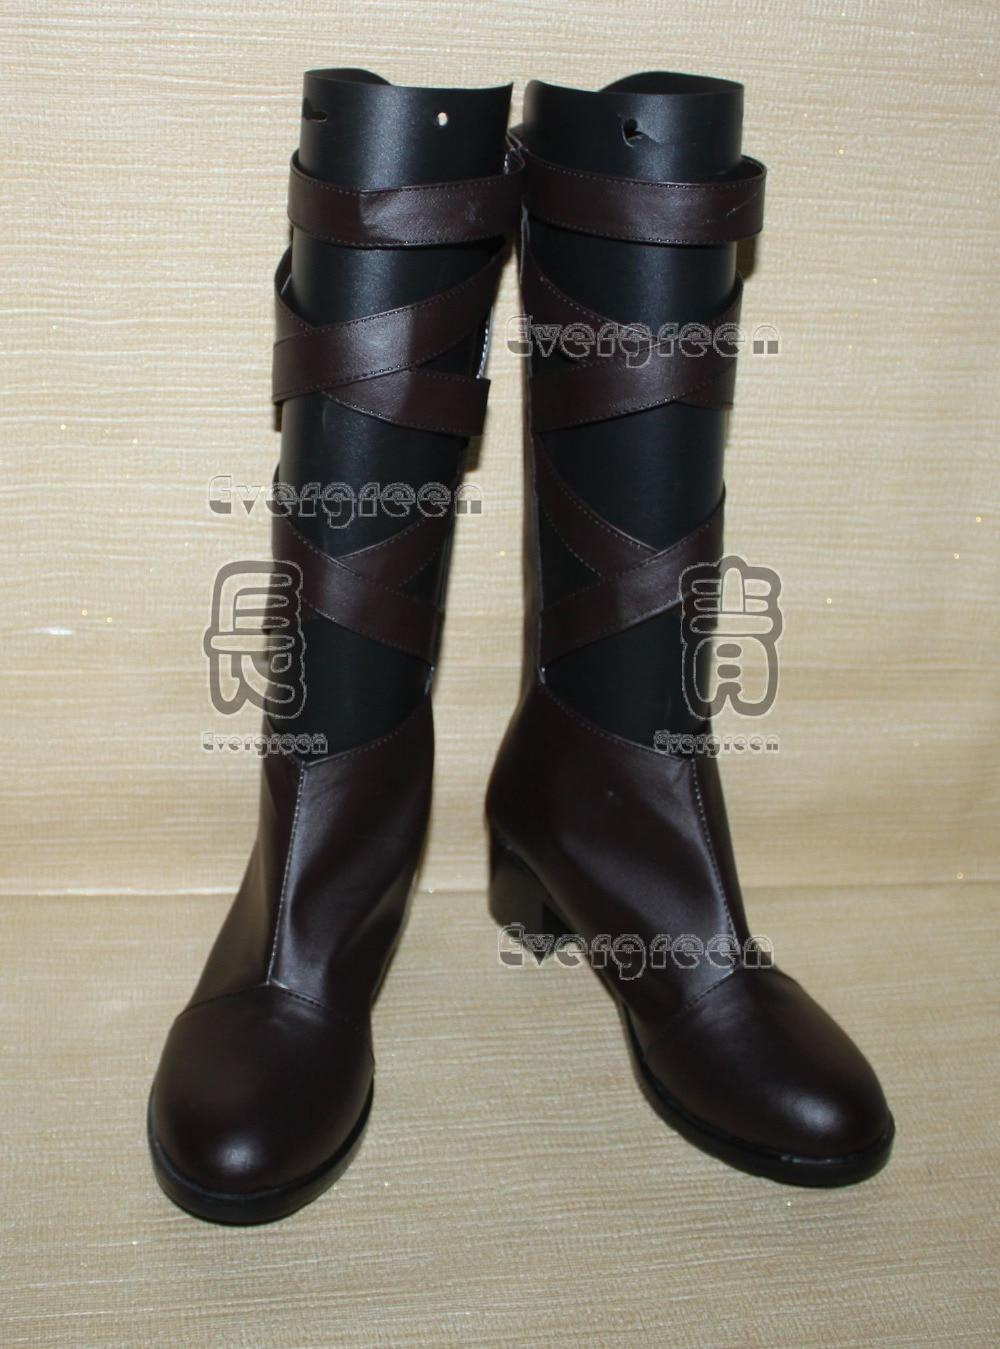 Saint Seiya Aiolos Cosplay zapatos largos botas C006